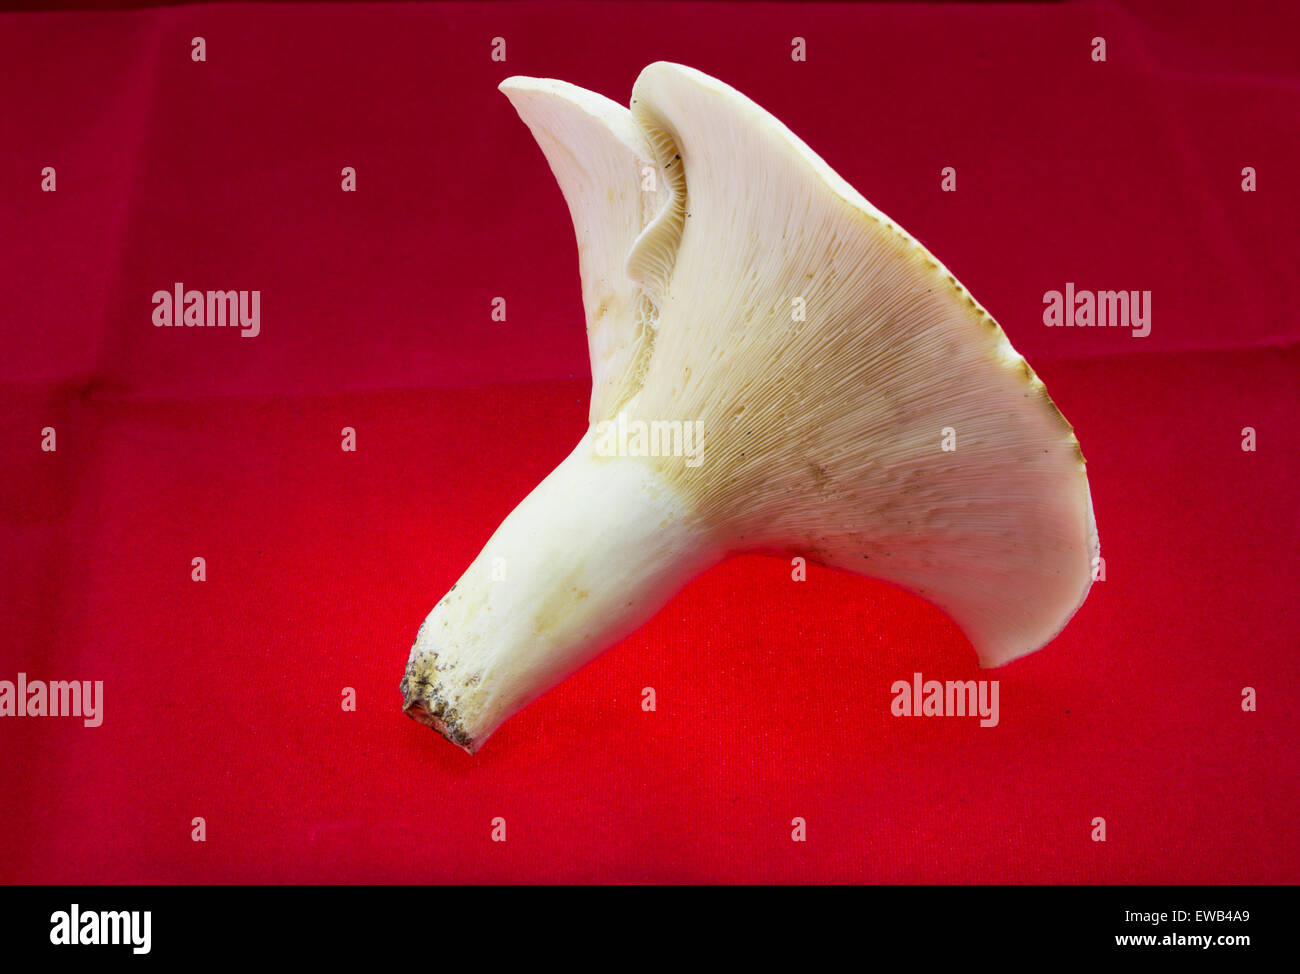 Mushroom Lactarius Piperatus isolated on red background - Stock Image